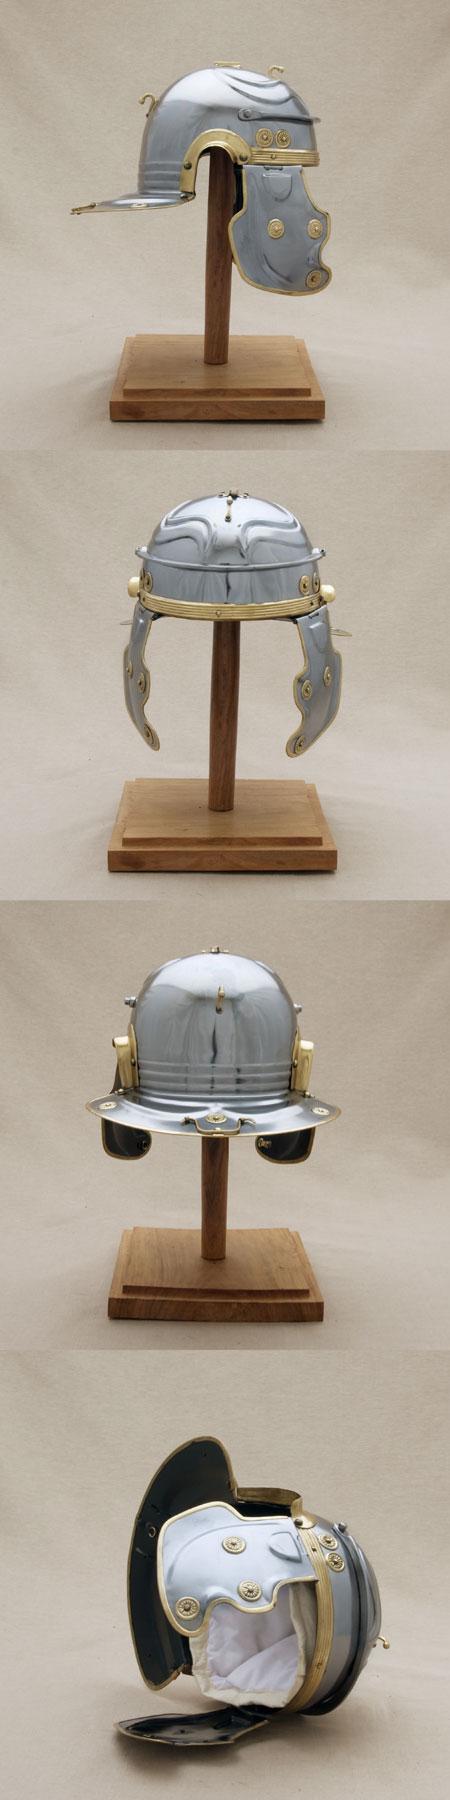 Römer Helm der Legionäre, Deepeeka - Replika, Typ Weisenau